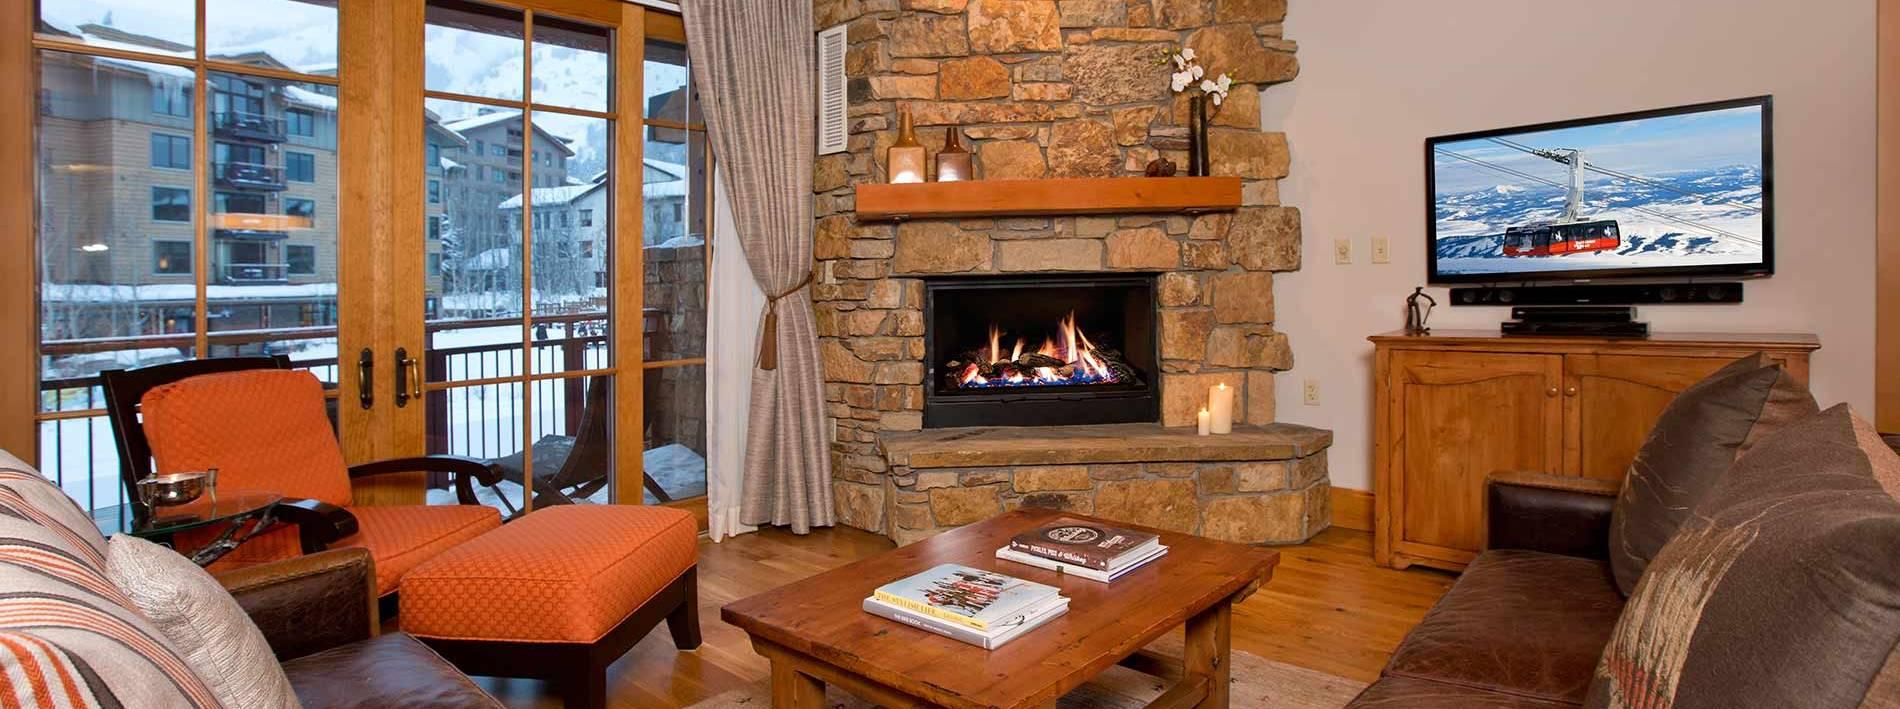 3285 West Village Drive #204,Teton Village,Wyoming,3 Bedrooms Bedrooms,3.5 BathroomsBathrooms,Private Home,3285 West Village Drive #204,1007